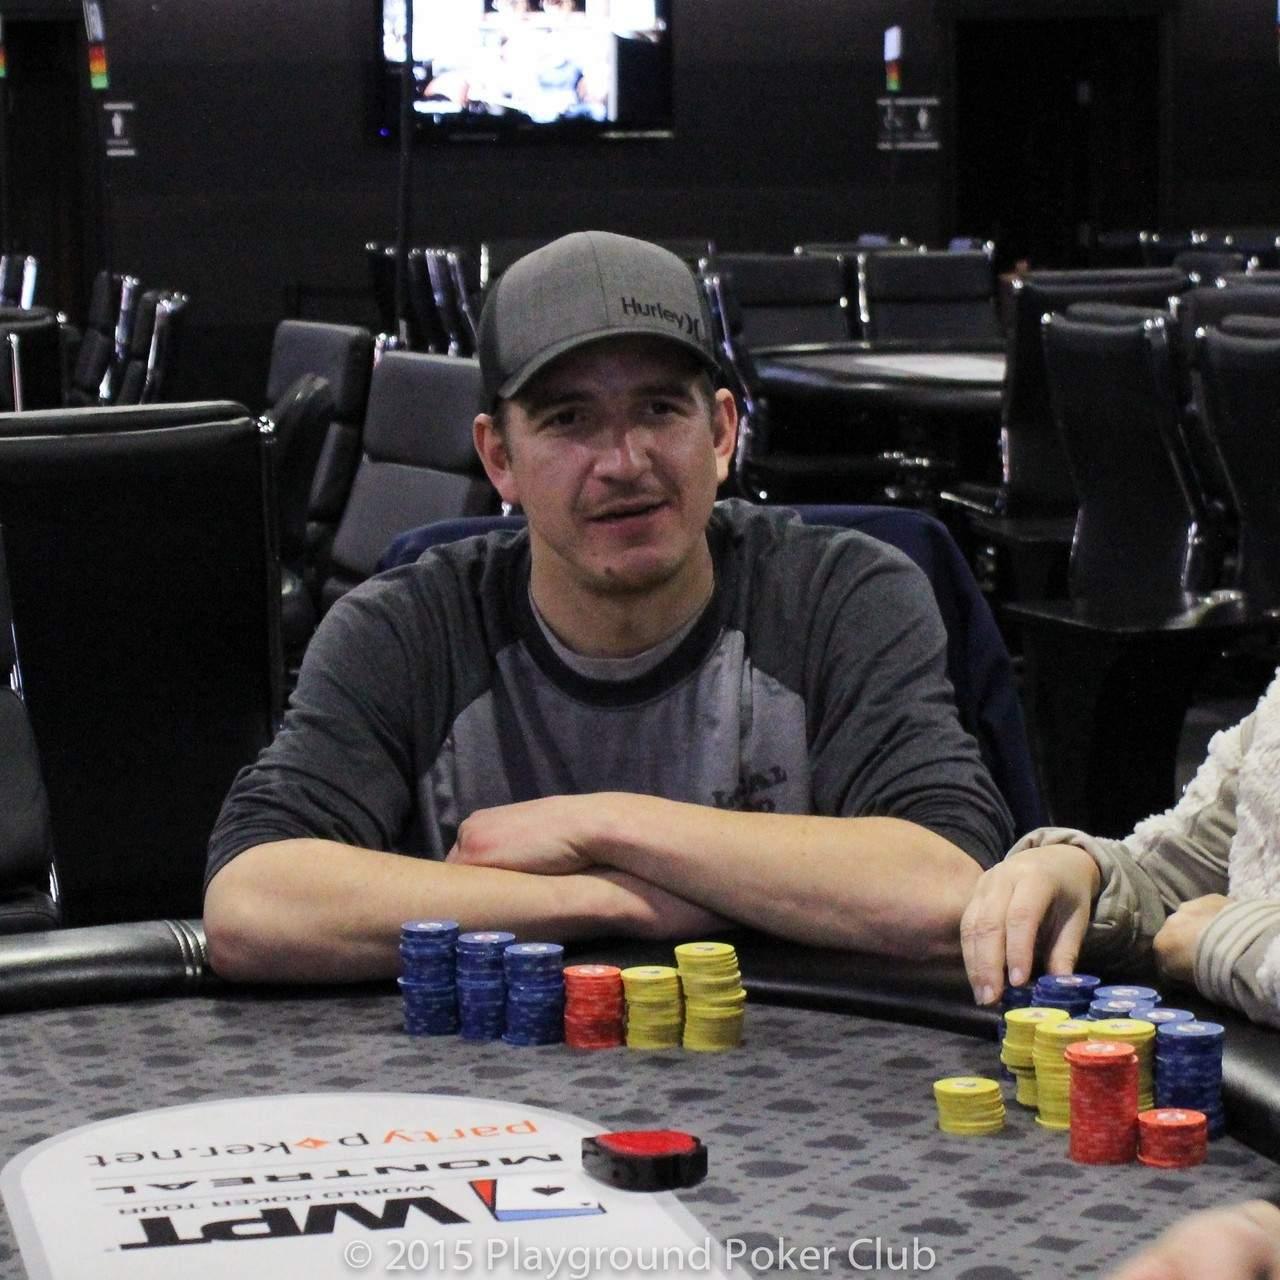 Bianca perron poker